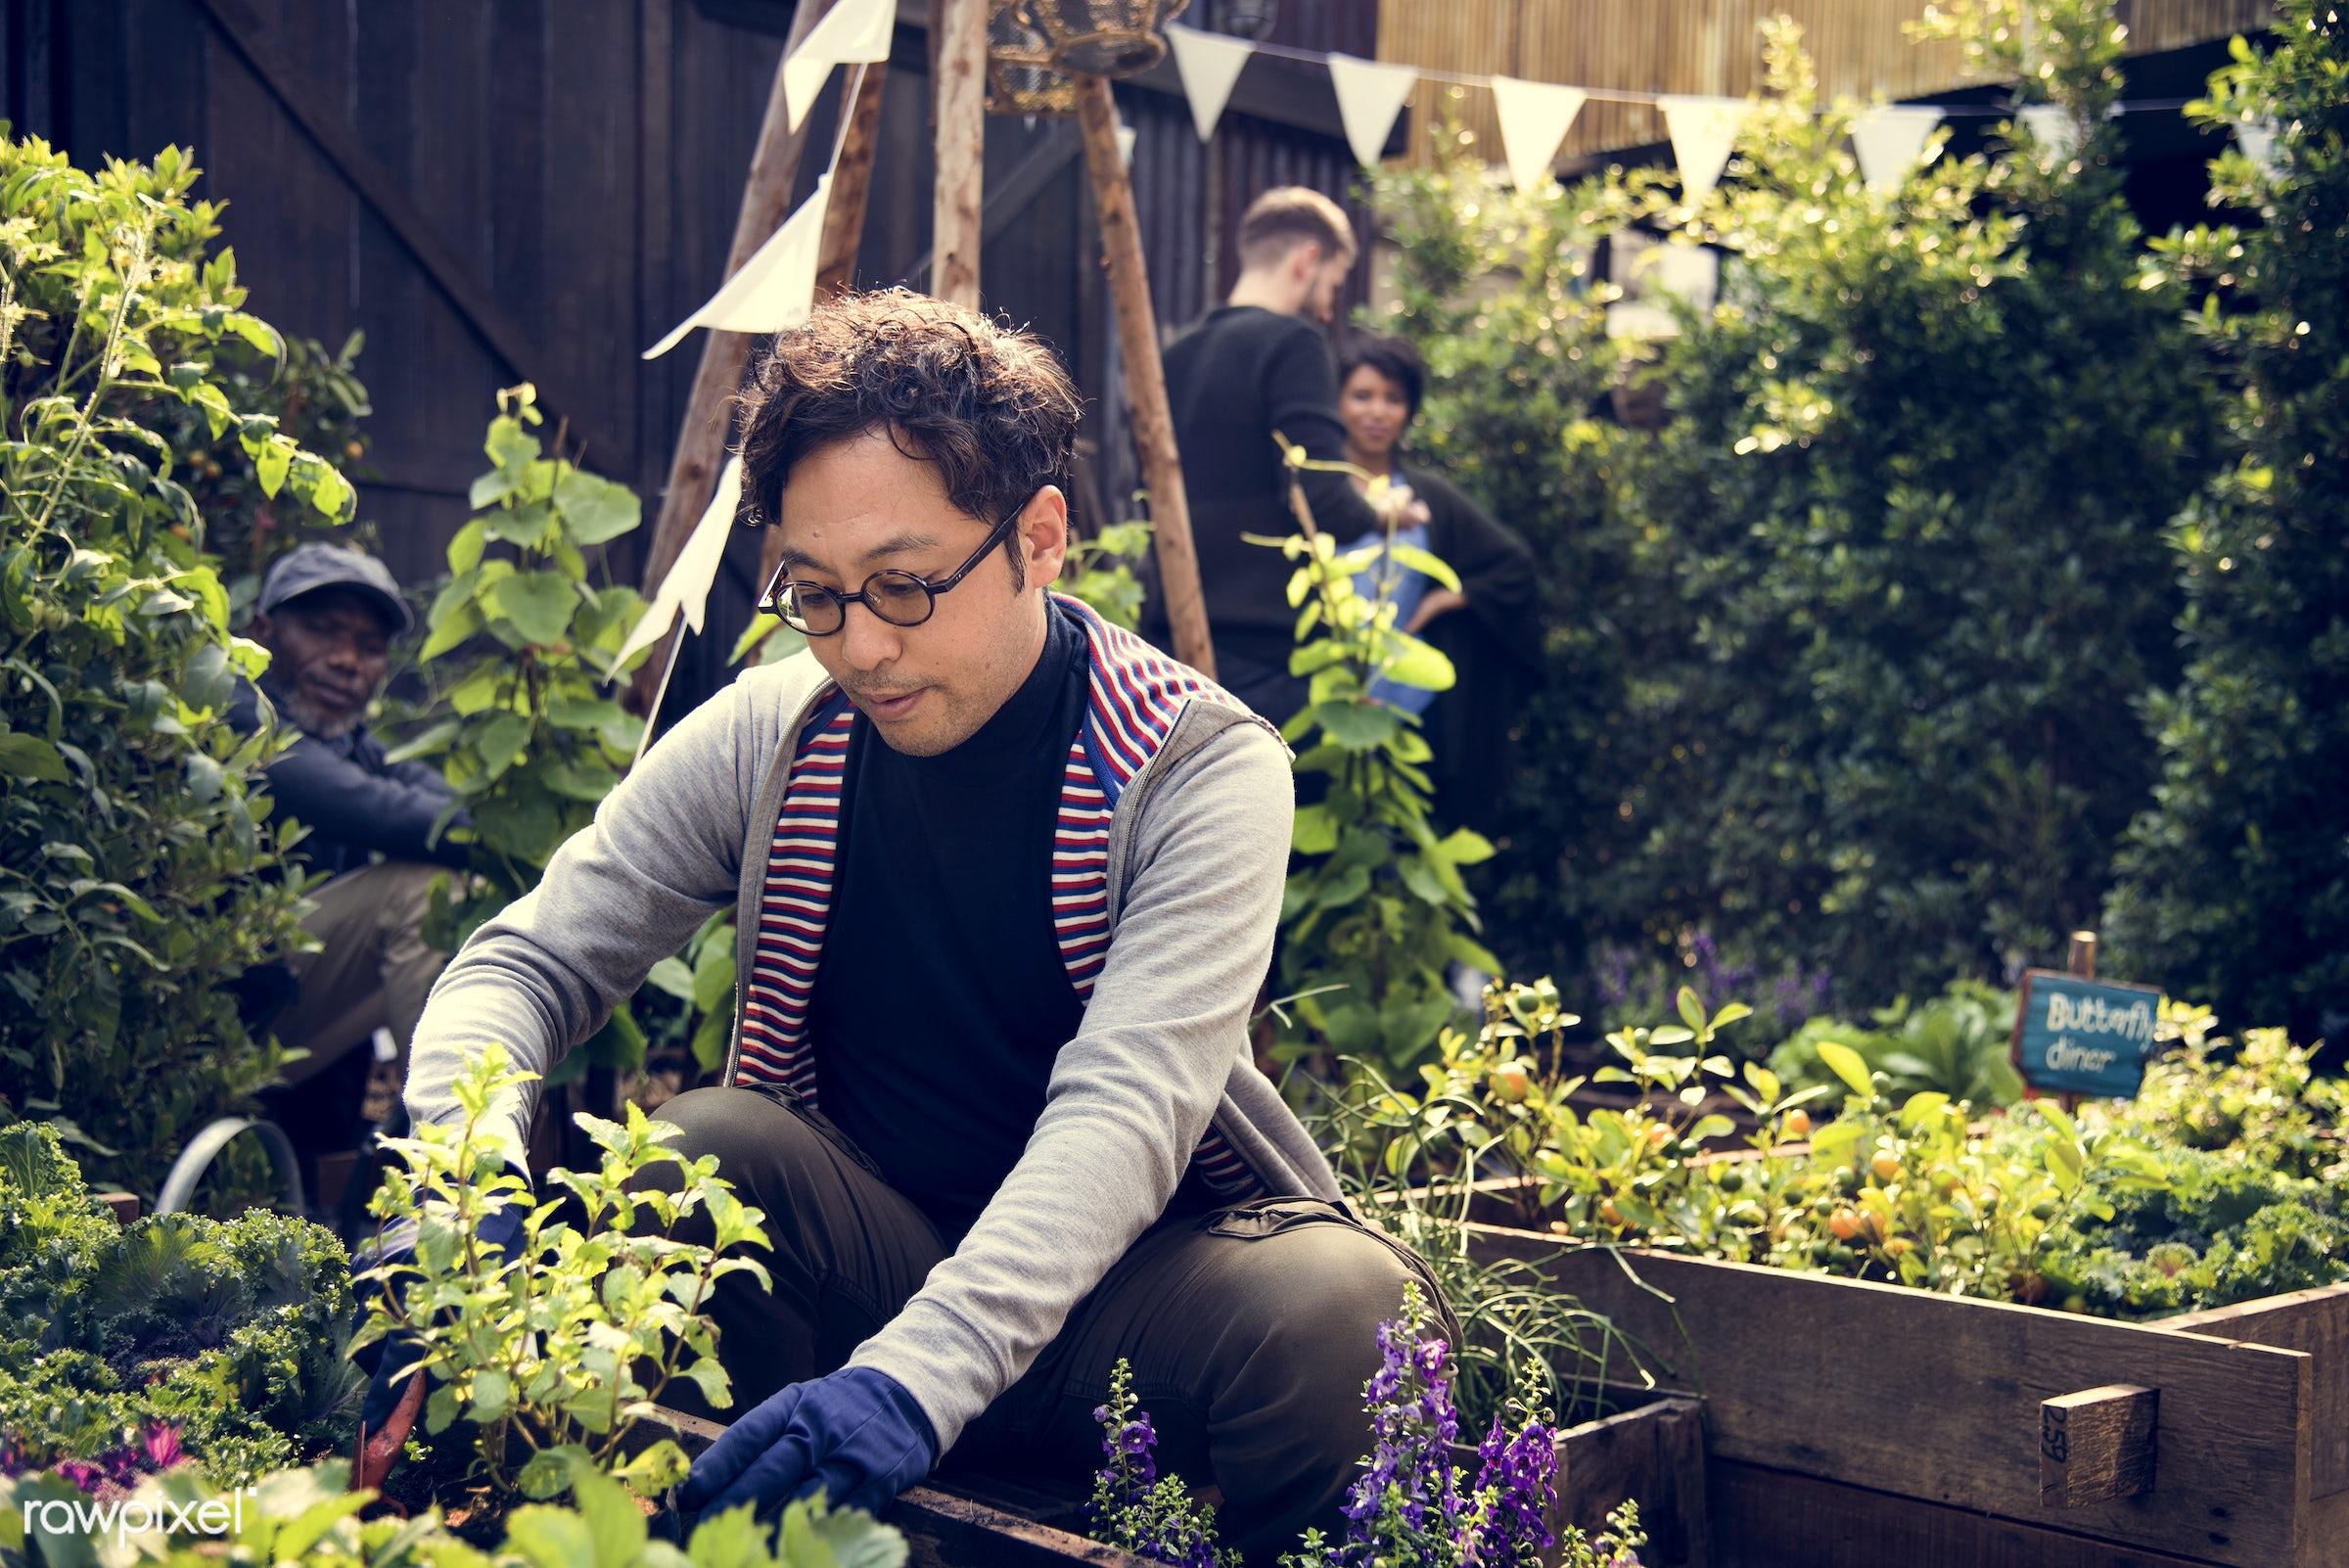 plant, countryside, person, botany, greenhouse, shrub, botanical, plantation, asian, tree, nature, lifestyle, worker, men,...